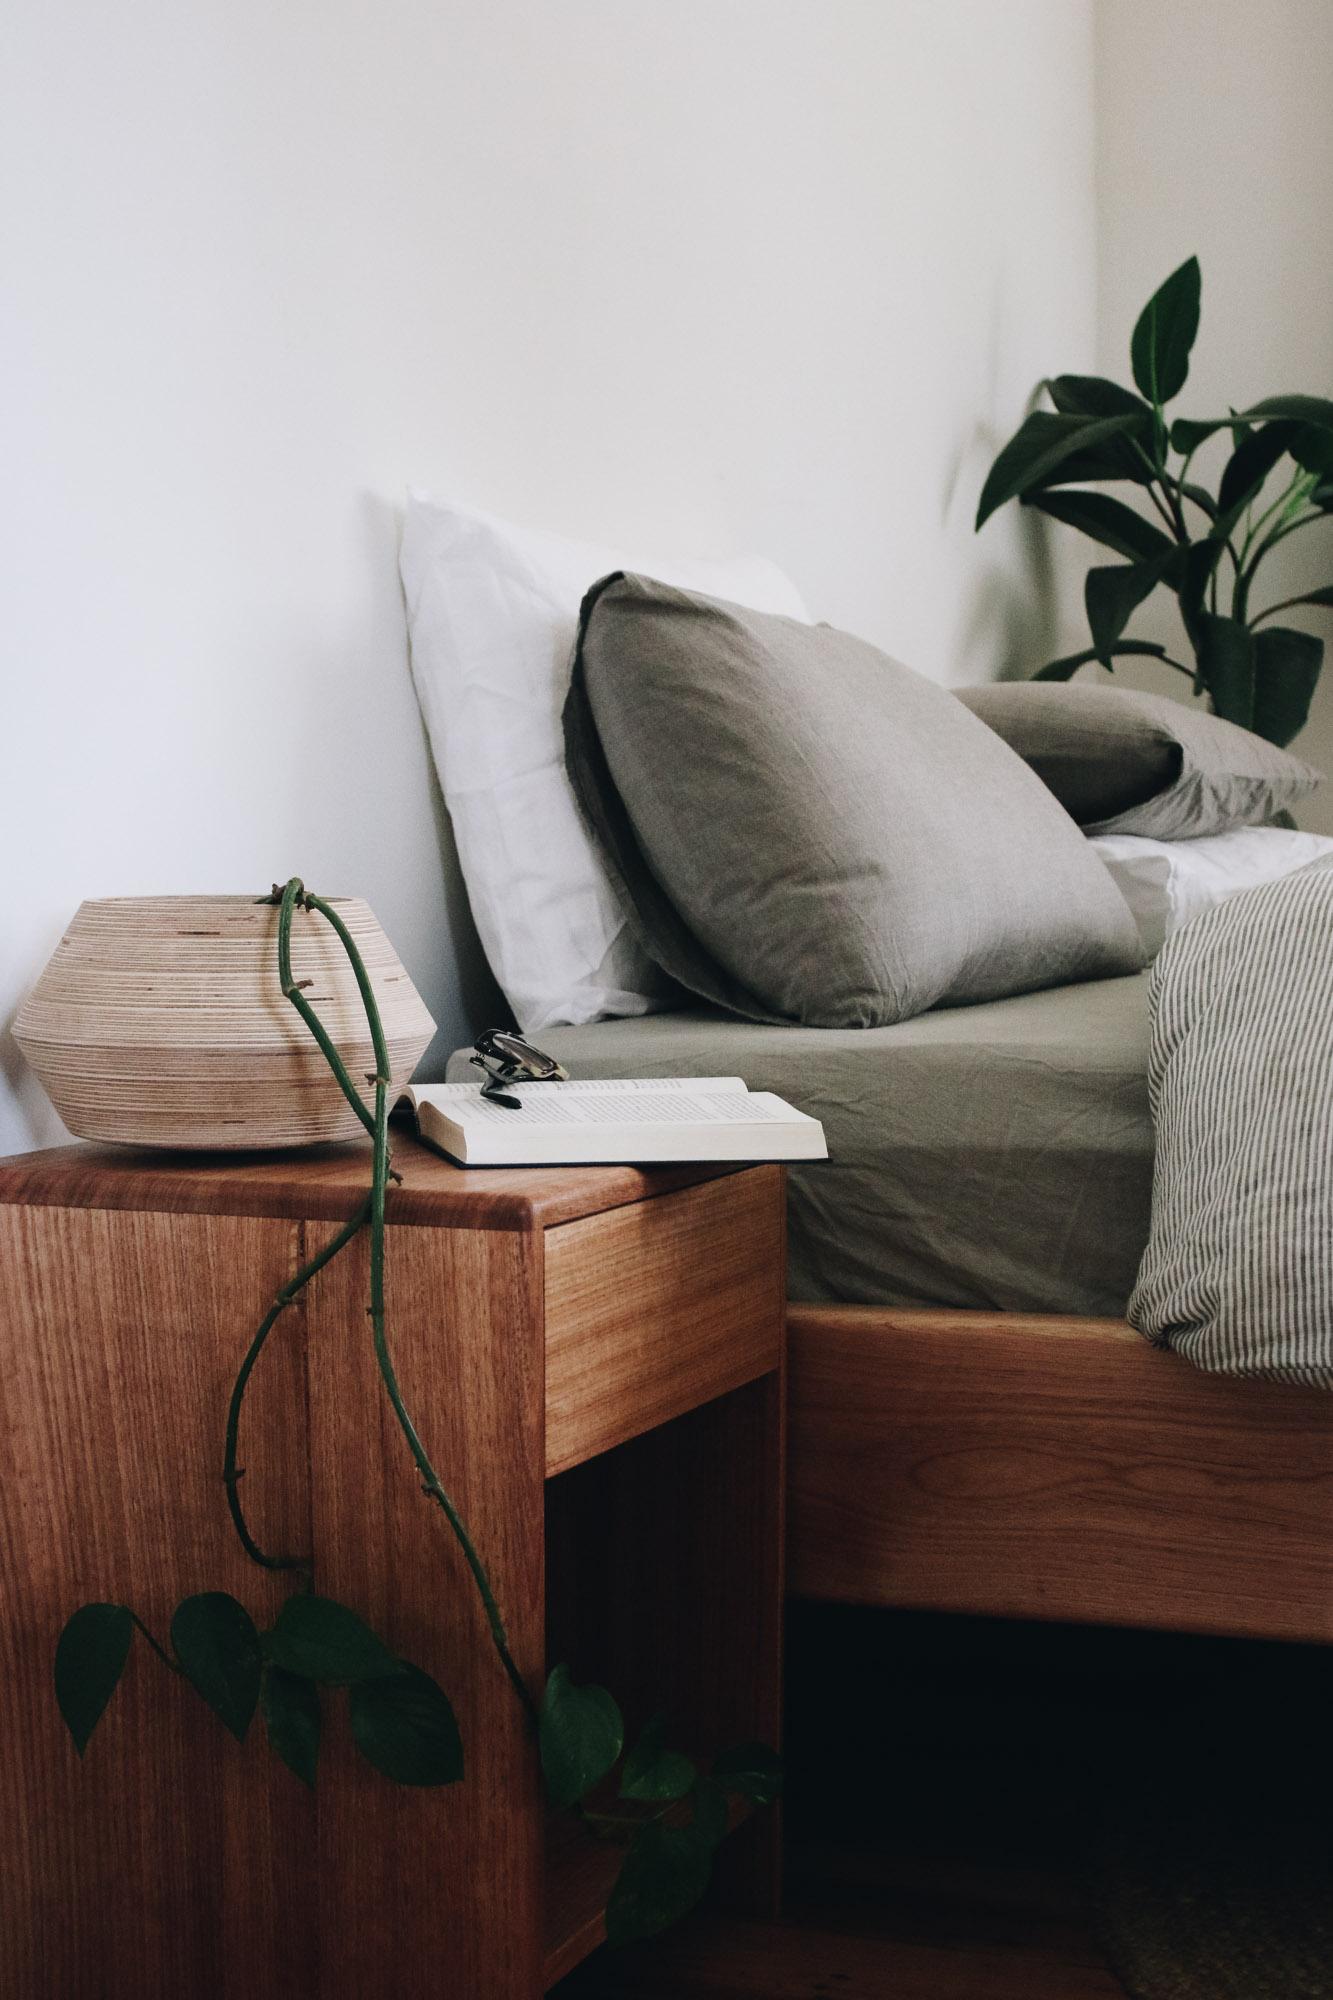 al-and-imo-handmade-simple-minimalist-low-timber-bed-frame-custom-australia-melbourne-10.jpg